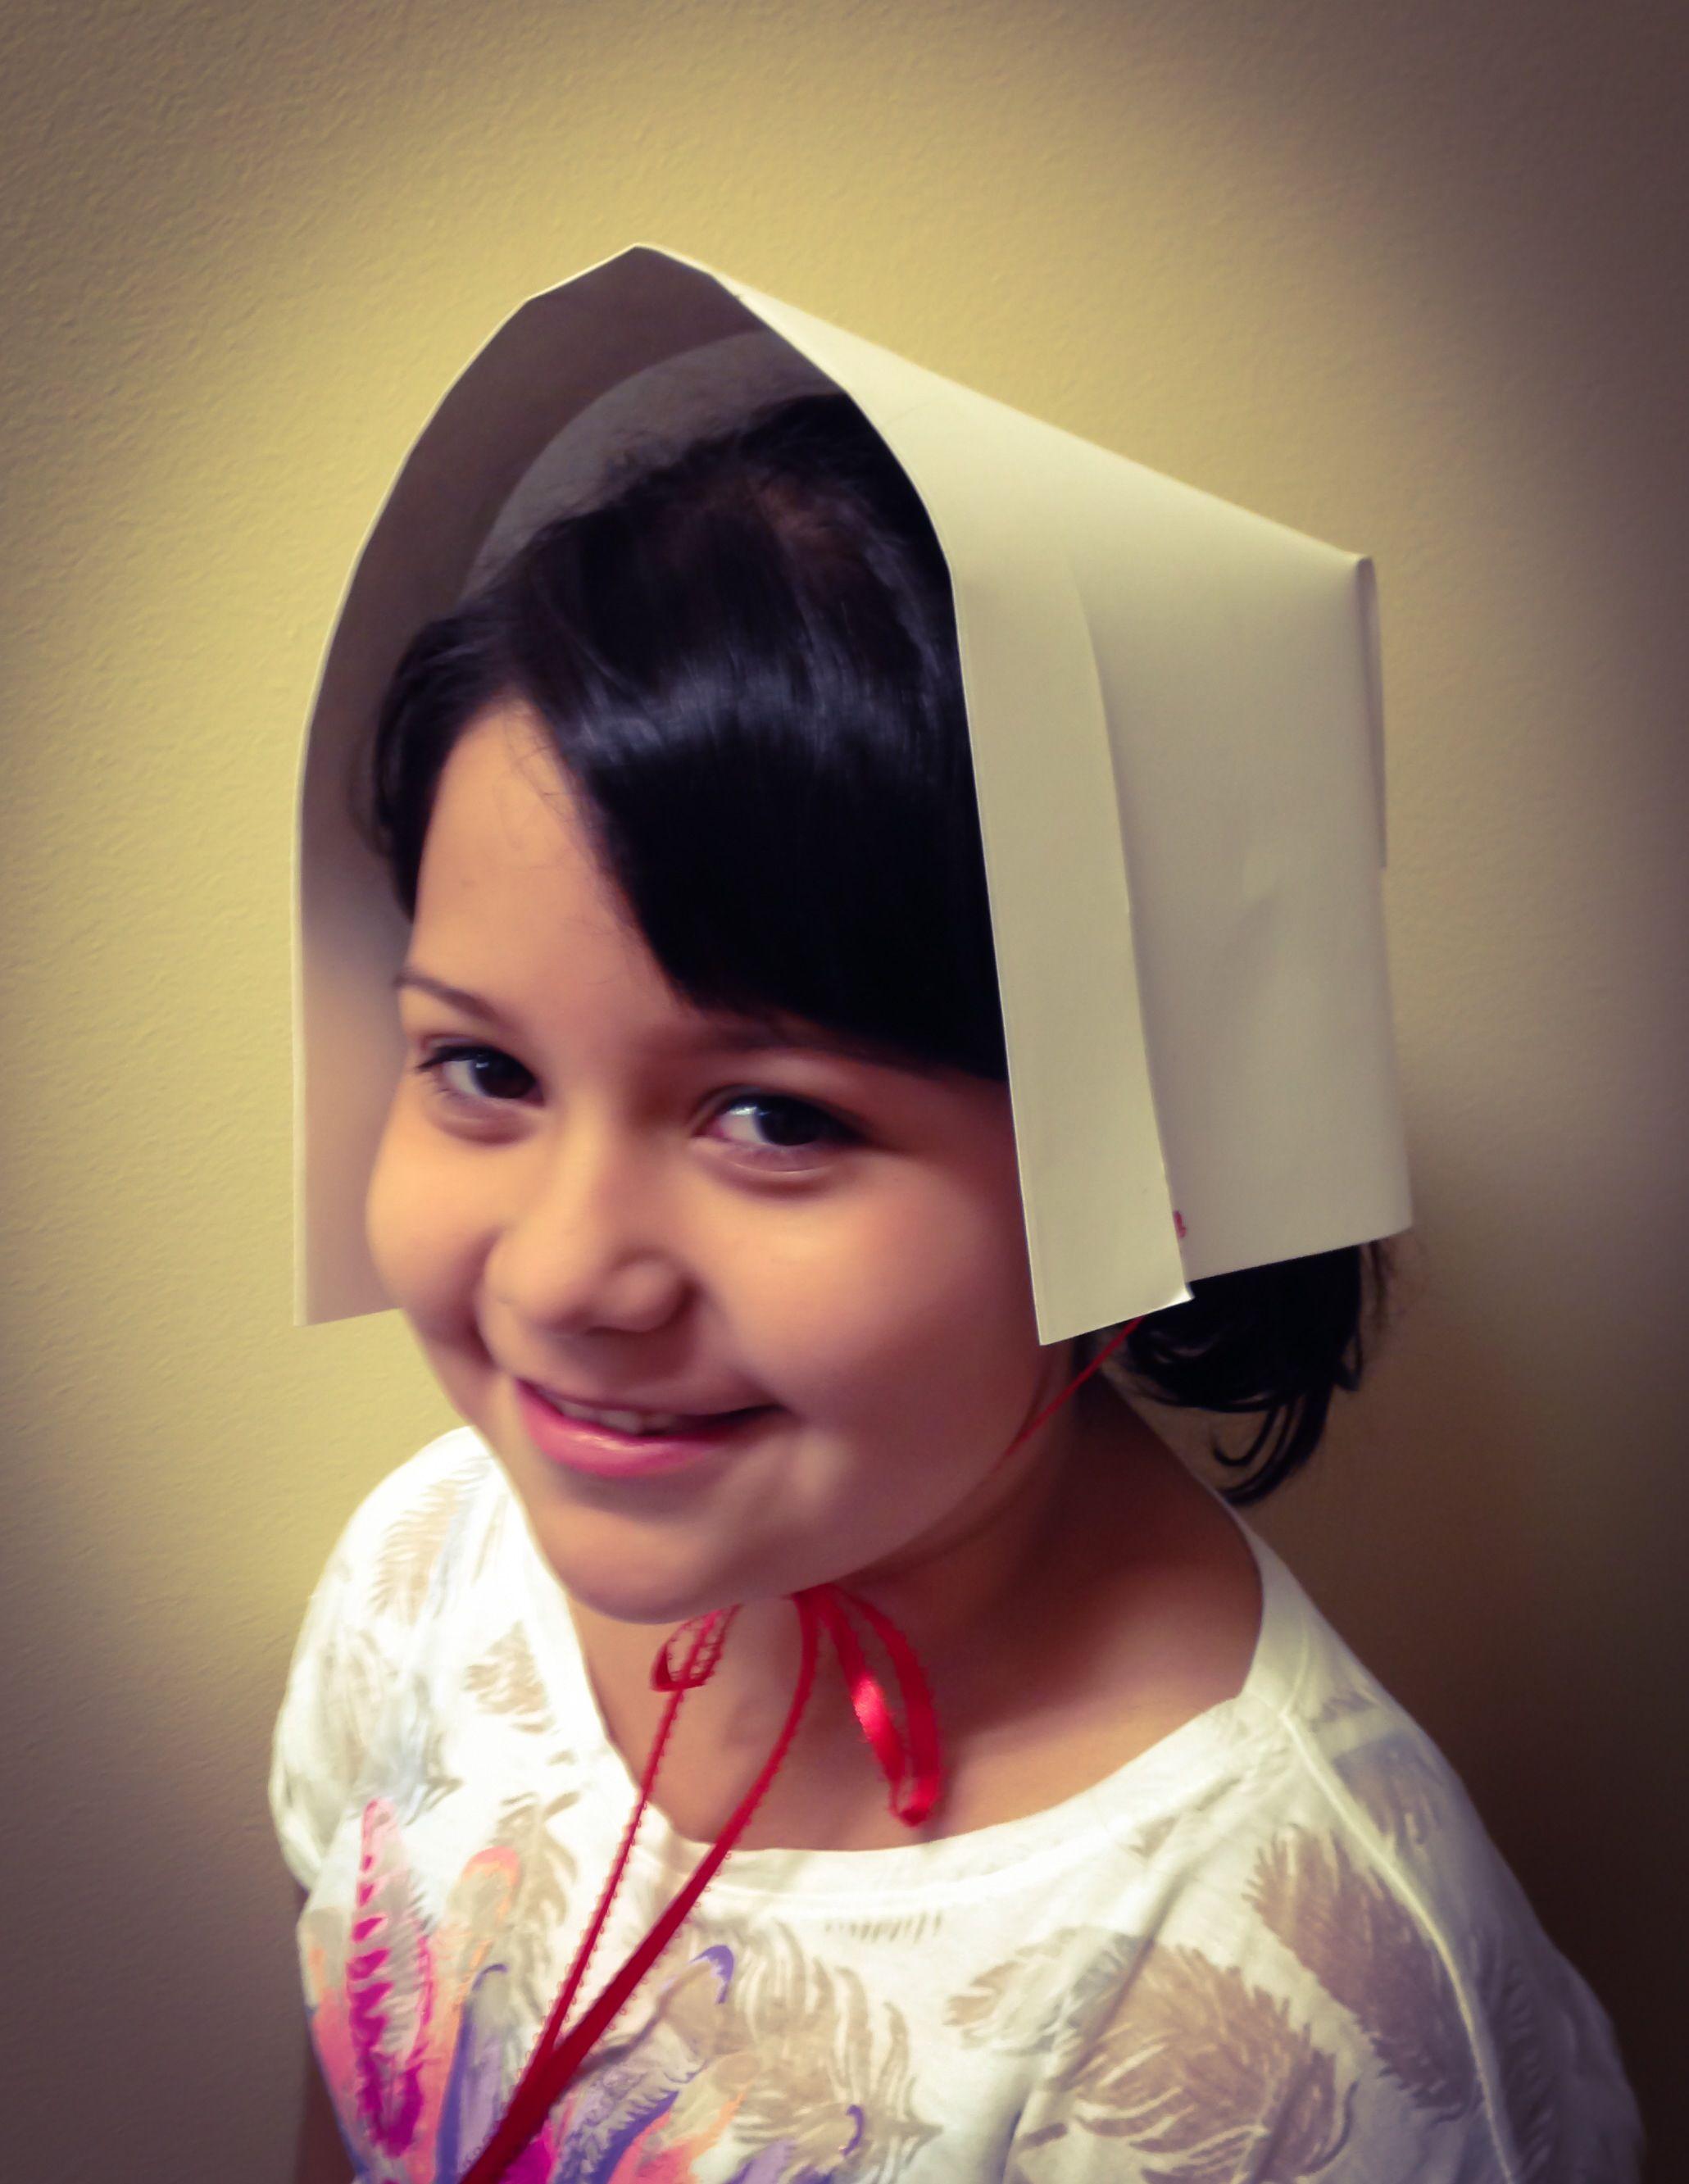 Pilgrim Bonnet made out of card stock Martha Stewart pattern